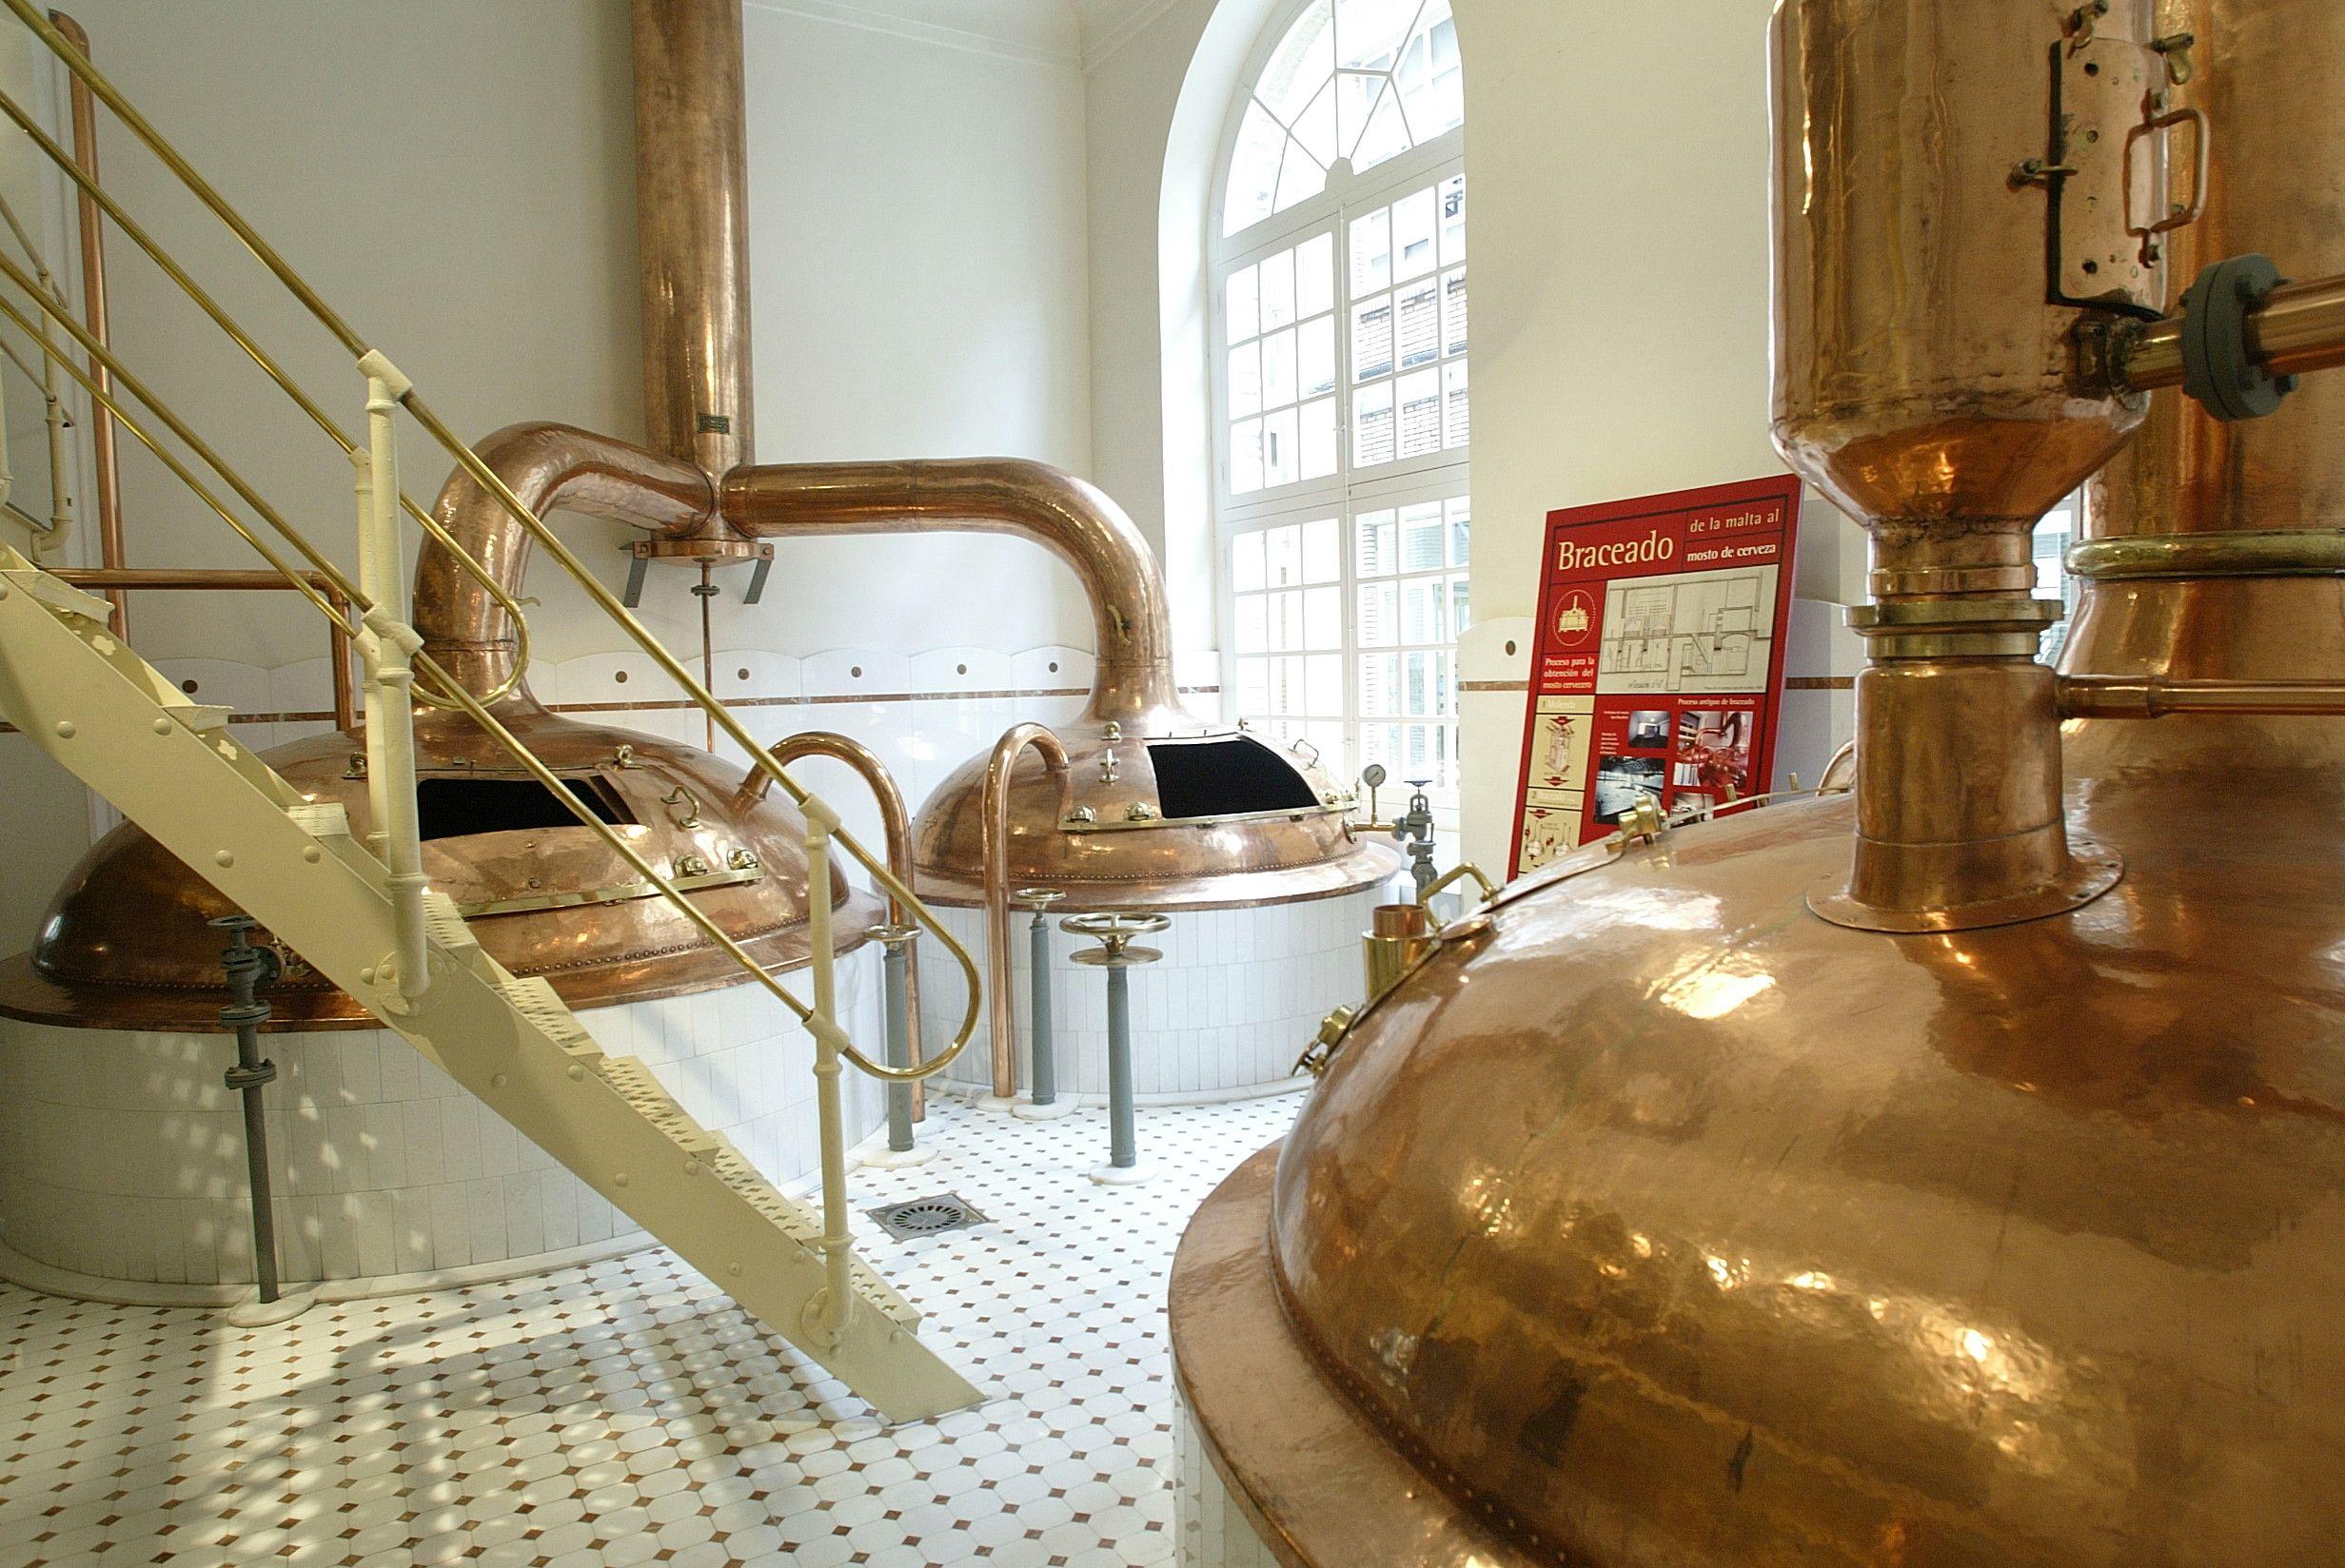 La antigua fábrica de La Zaragozana acoge este fin de semana el Zaragoza Beer Festival